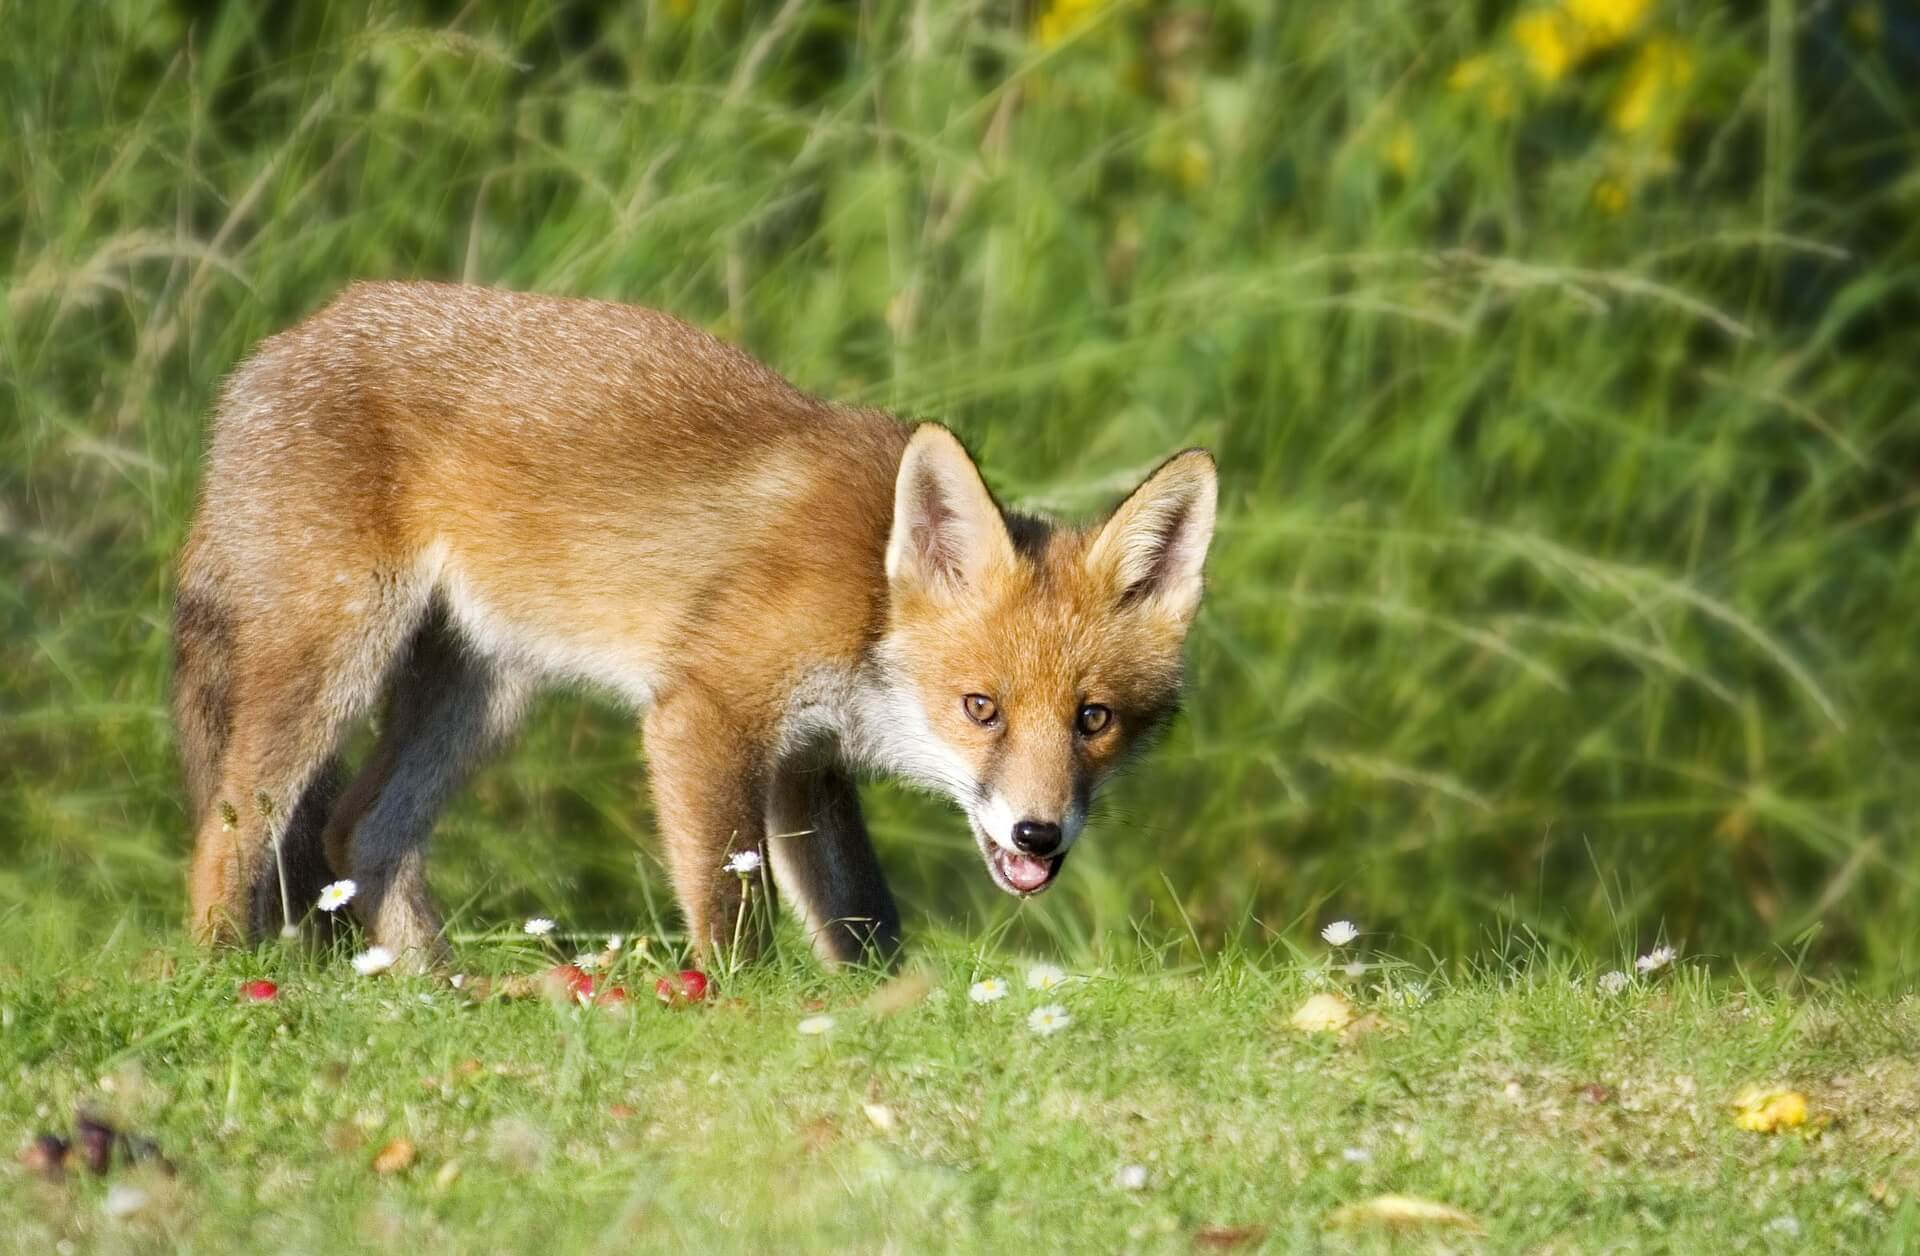 Tierschutzaktion-Oktober-2017_PETA-Fuchs_Beitragsbild_fox-1164951_1920